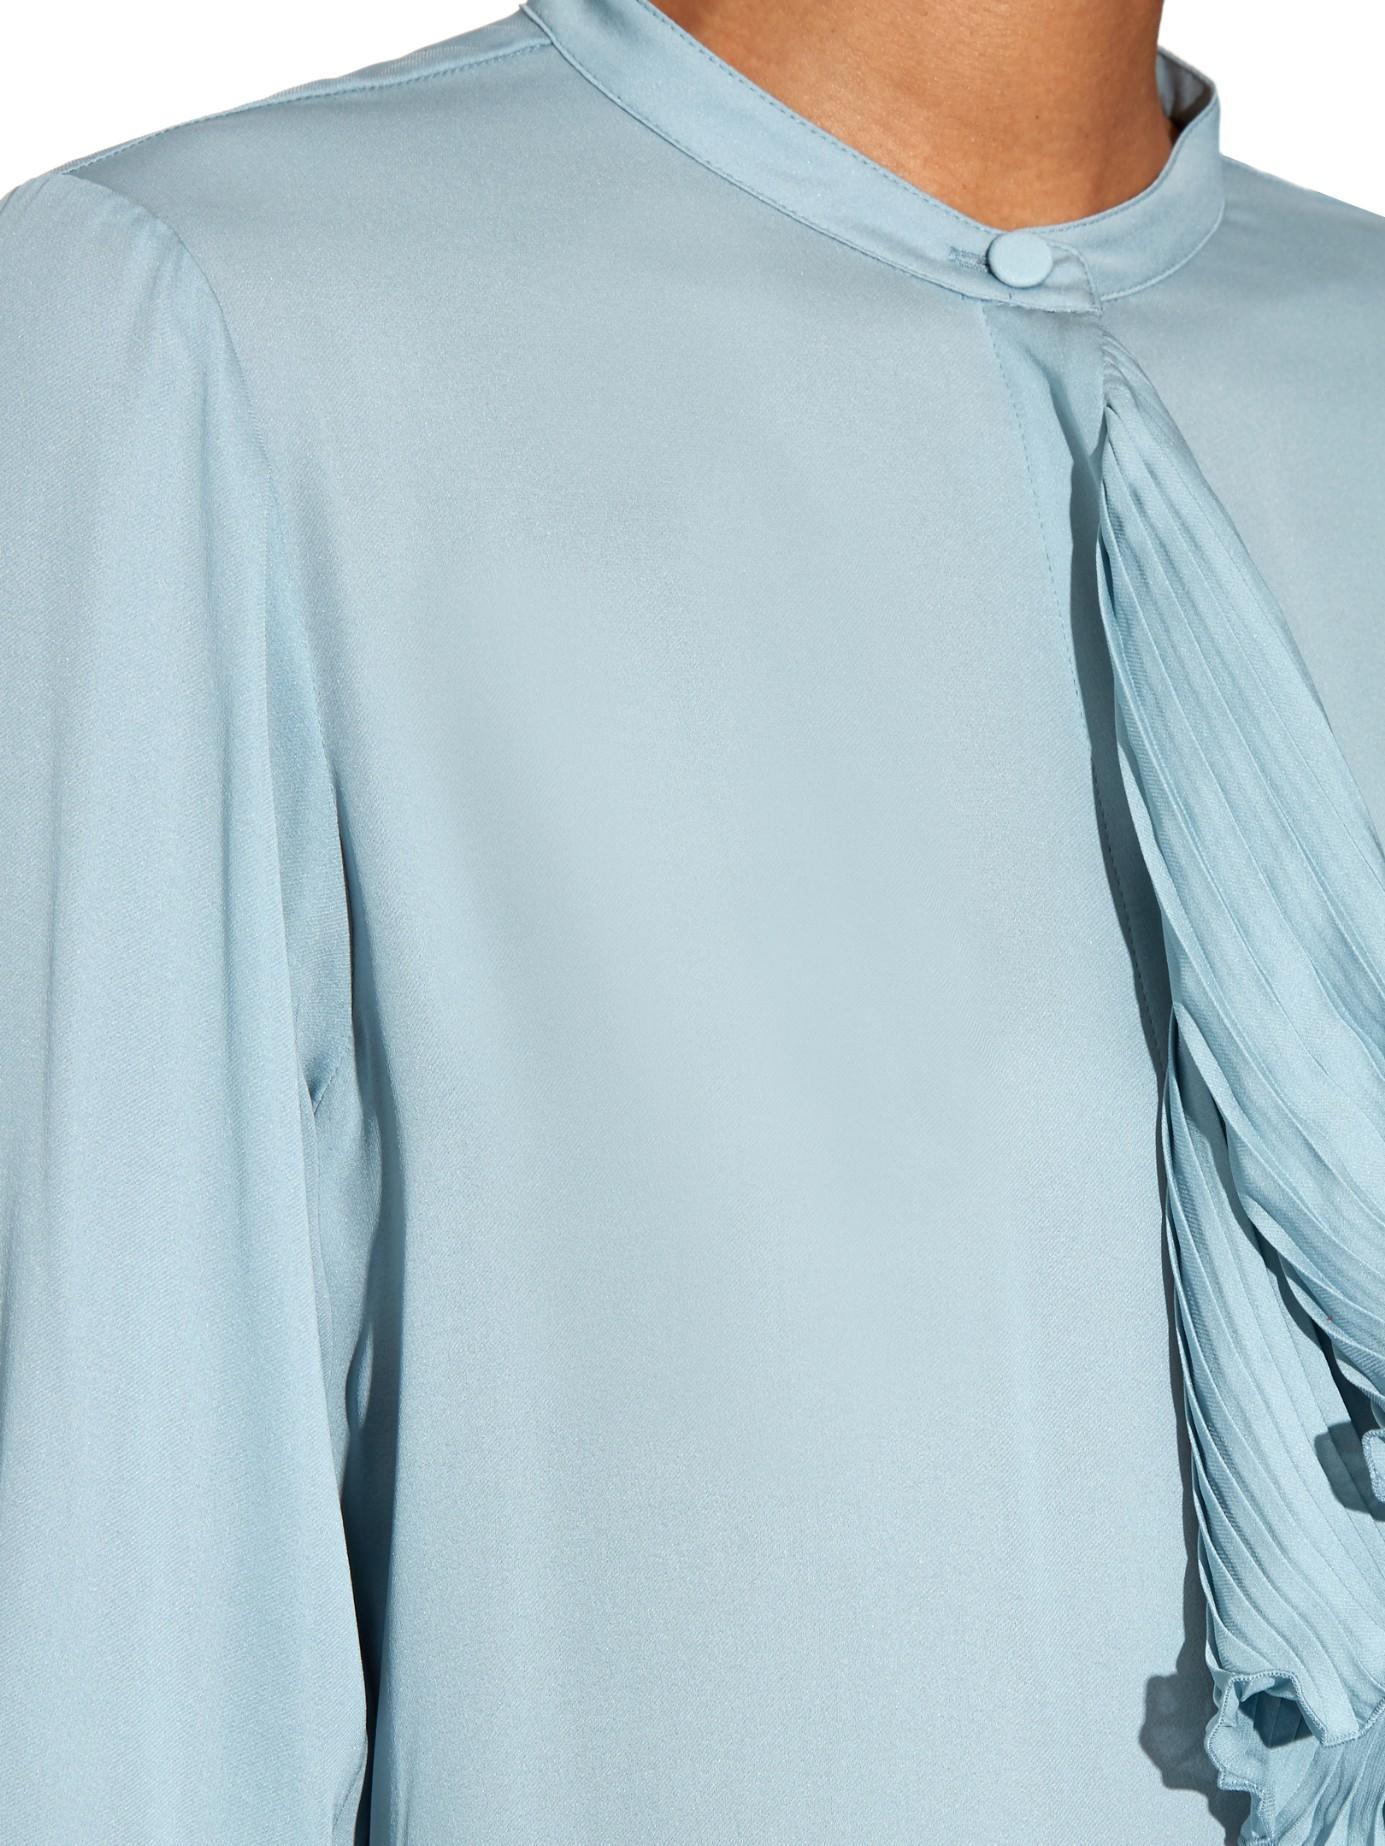 Ruffled Shirts Blouses